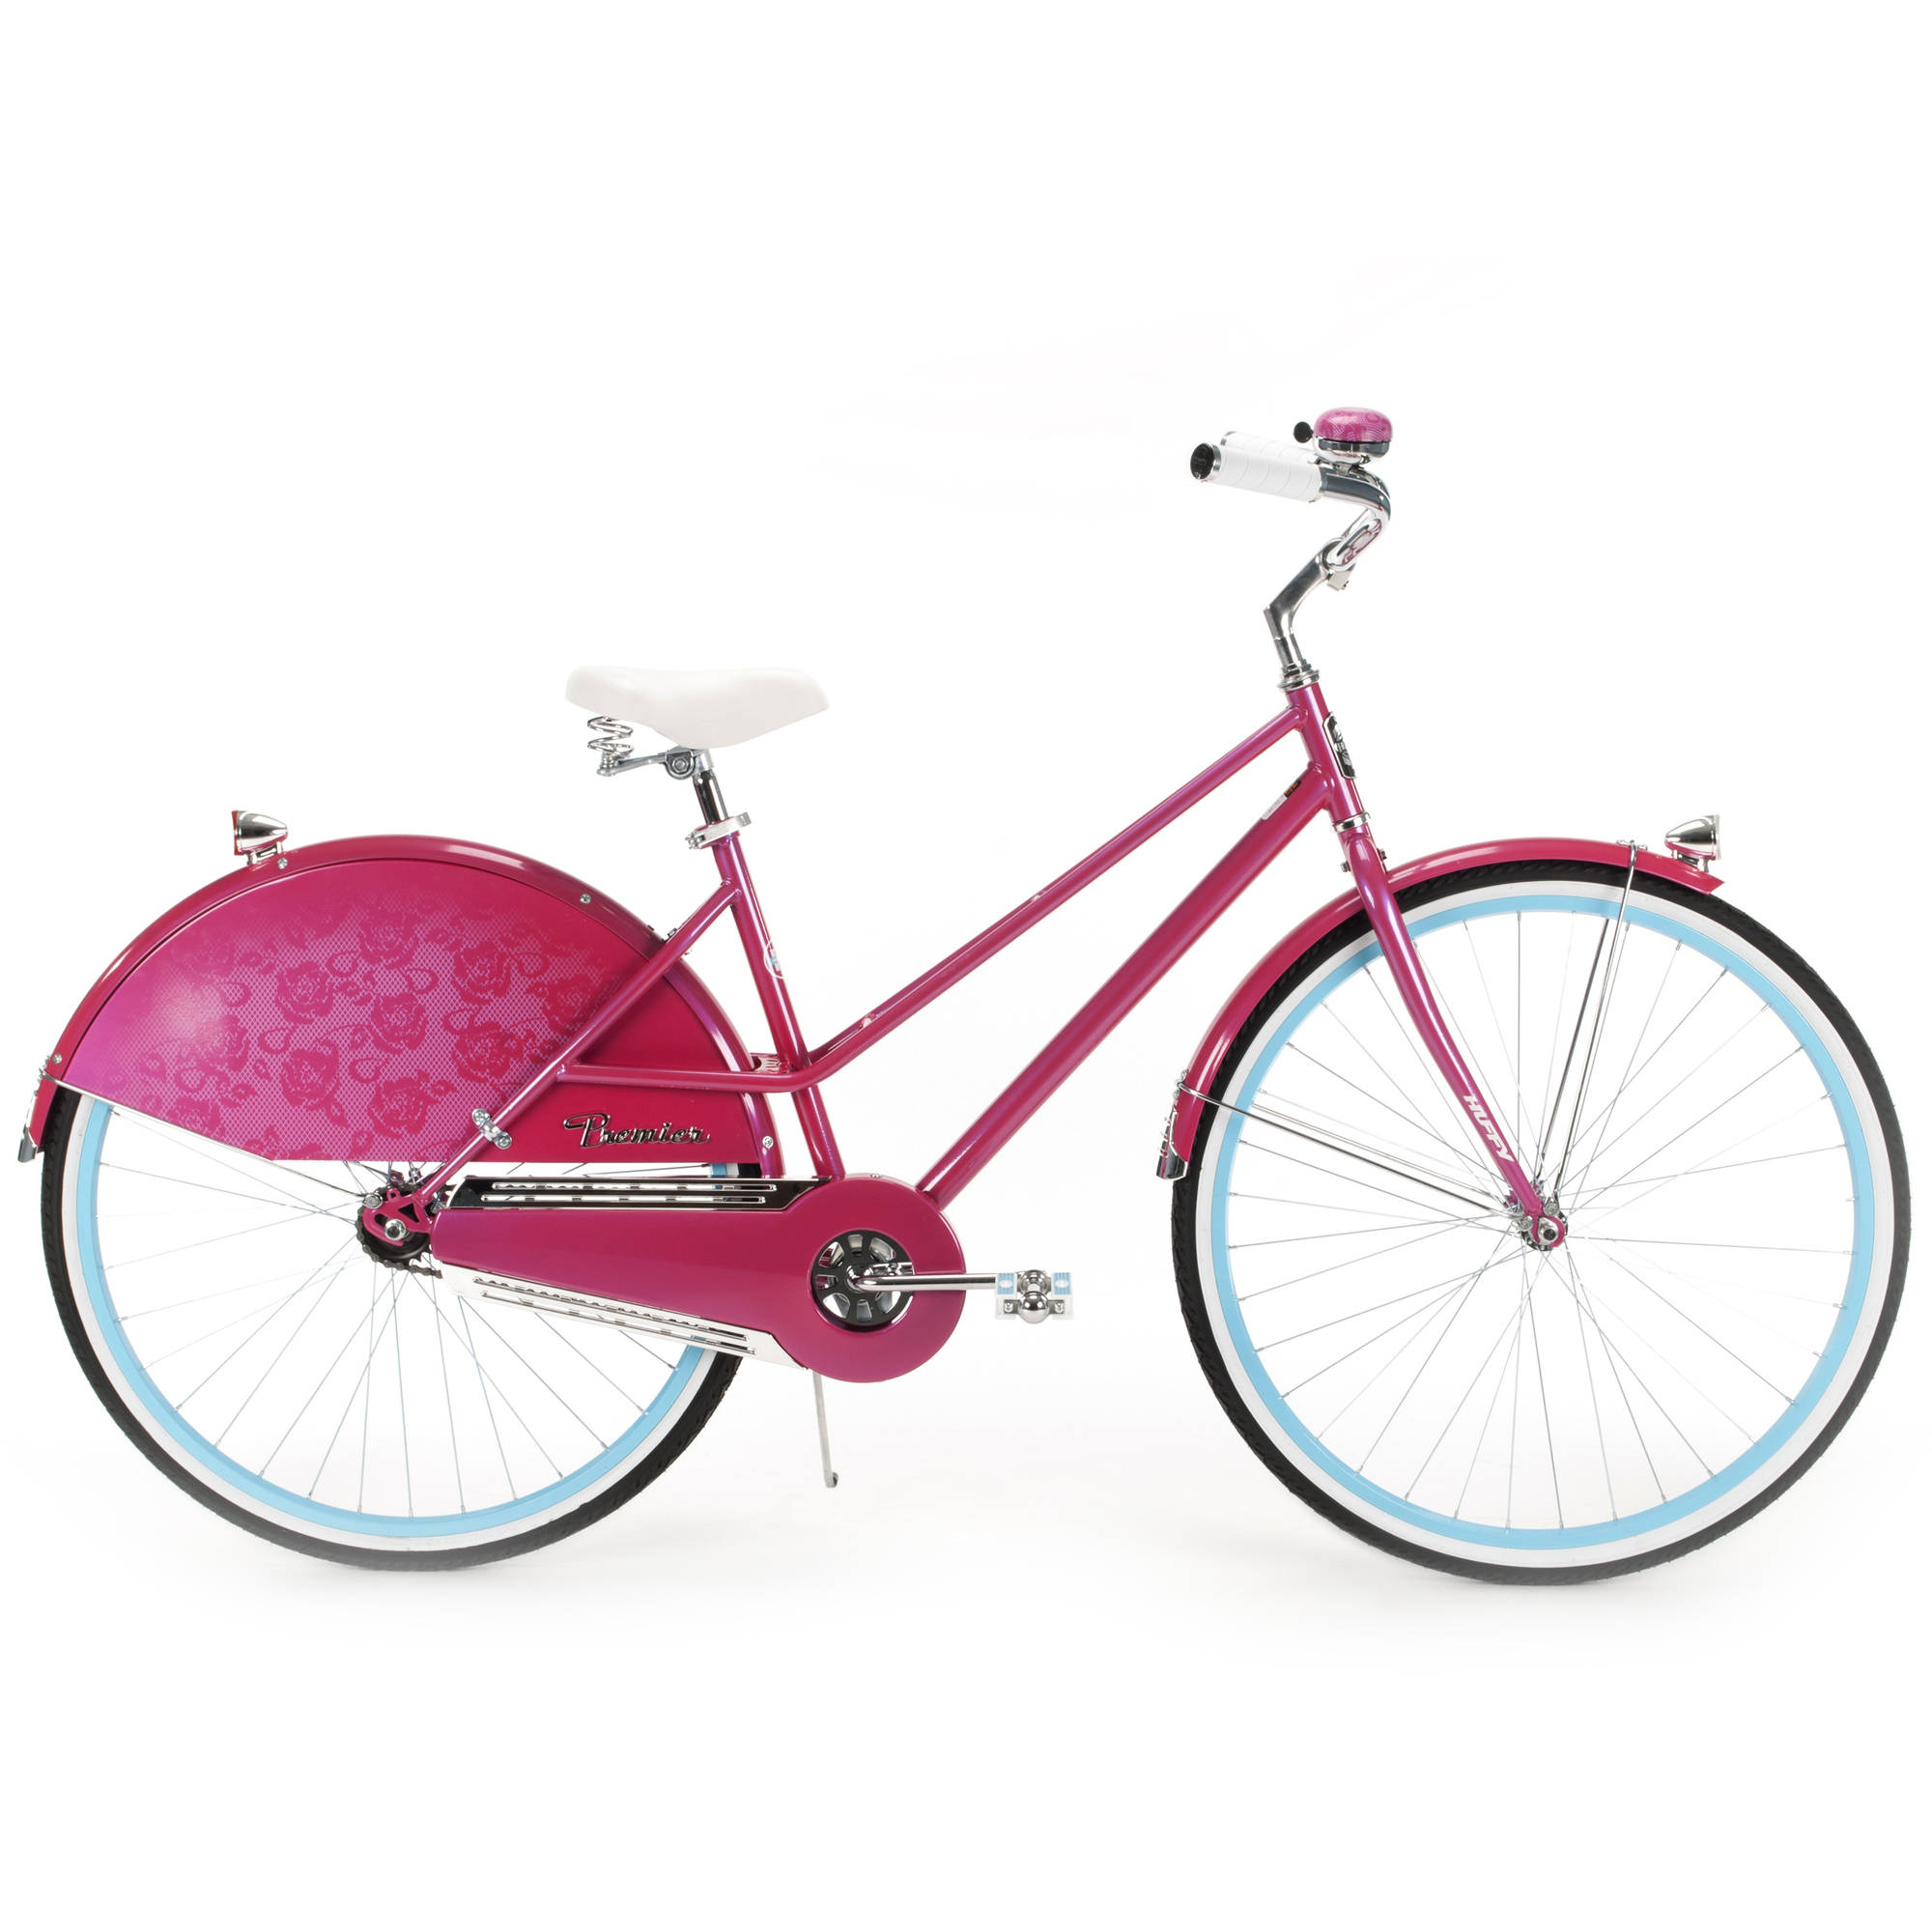 700c Huffy Premier Women S Cruiser Bike Pink Walmart Com Walmart Com